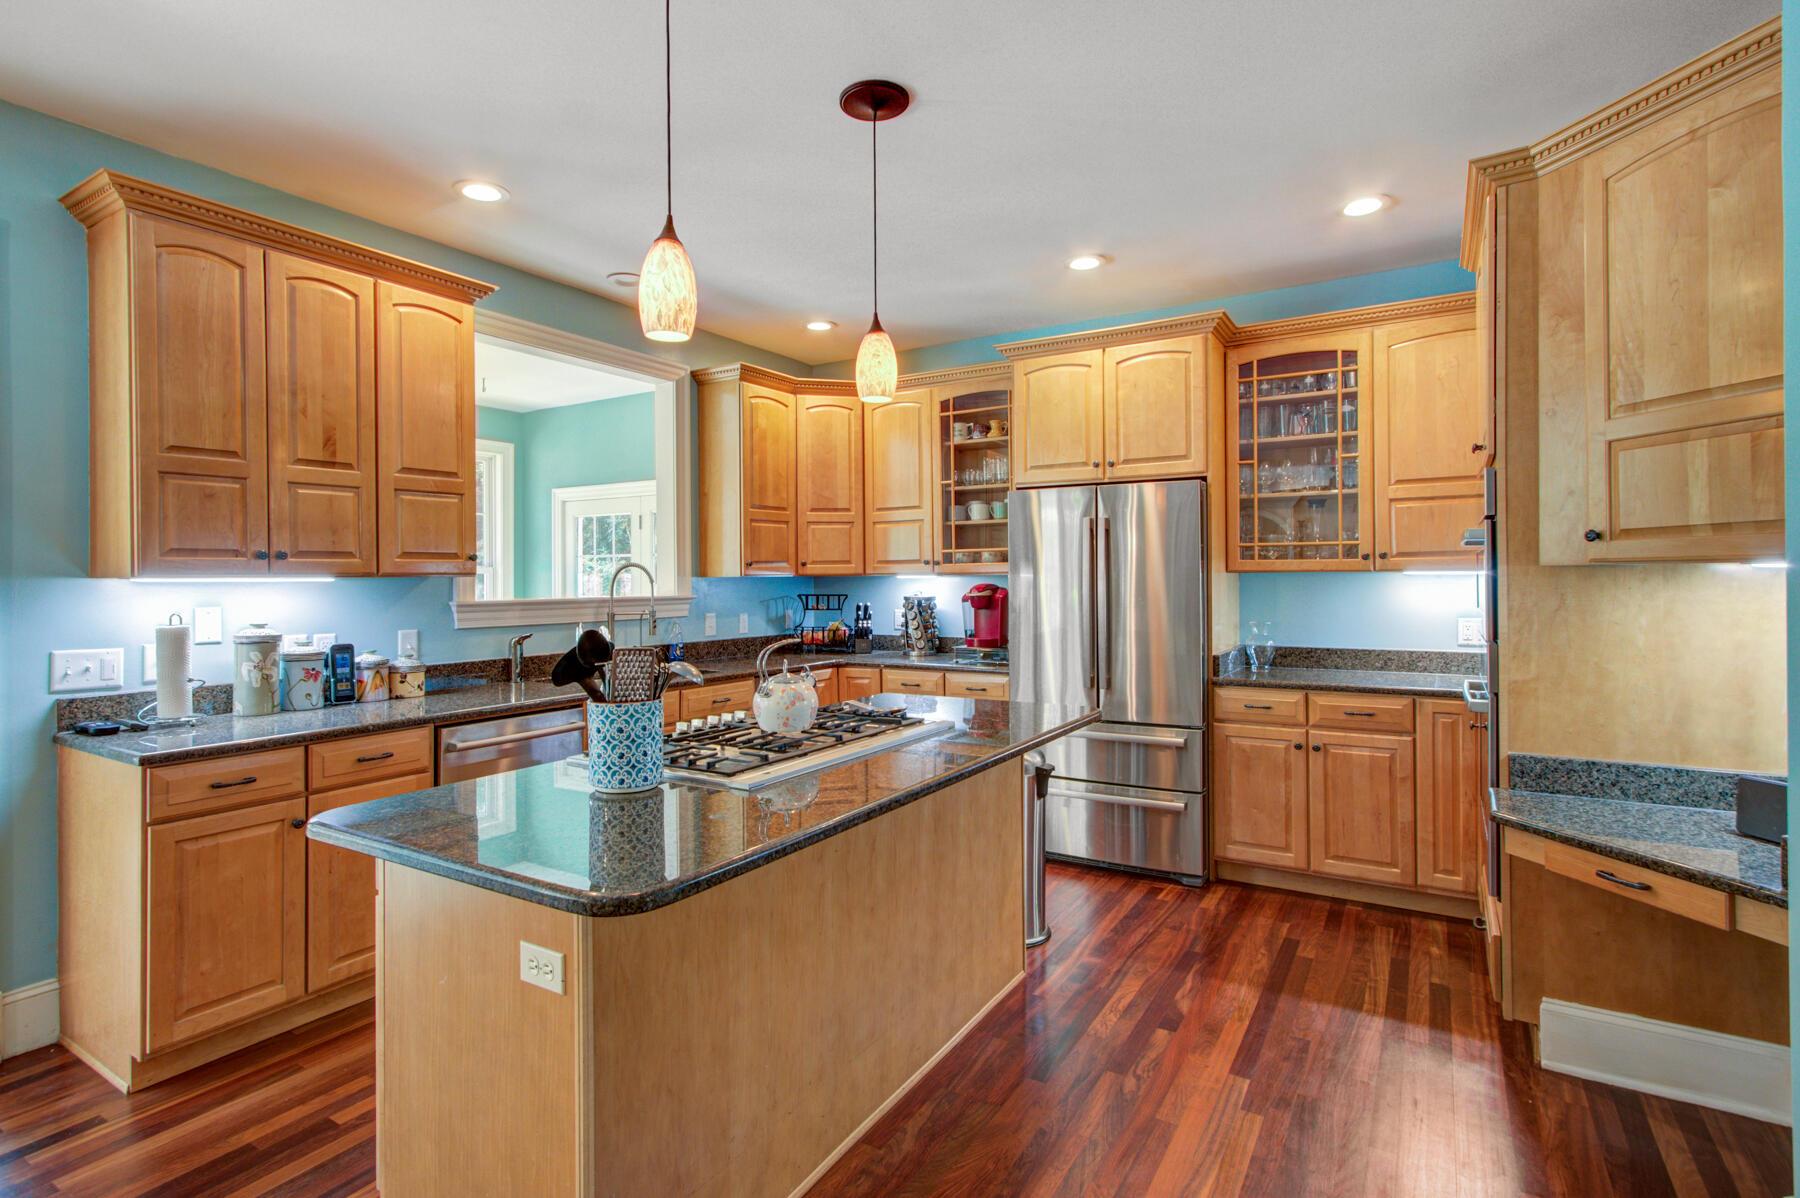 Dunes West Homes For Sale - 3095 Pignatelli, Mount Pleasant, SC - 14